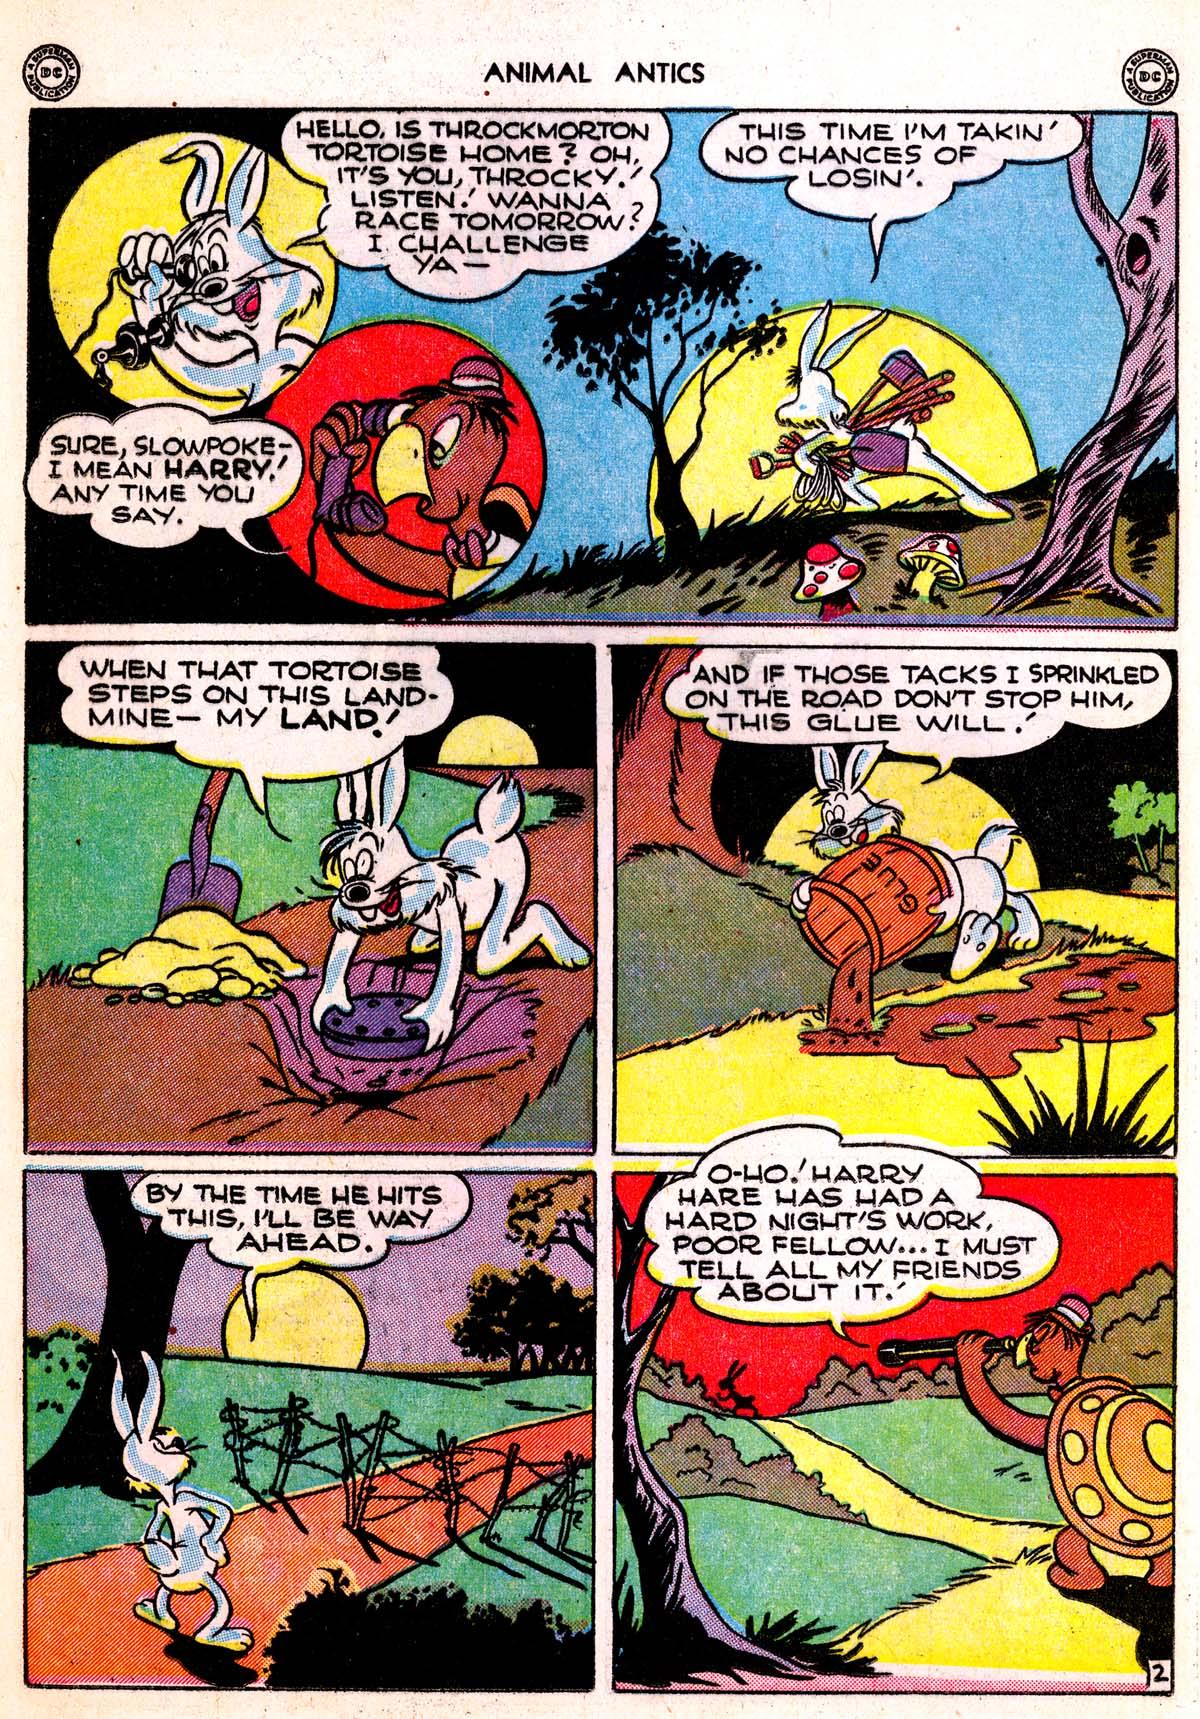 Read online Animal Antics comic -  Issue #1 - 22